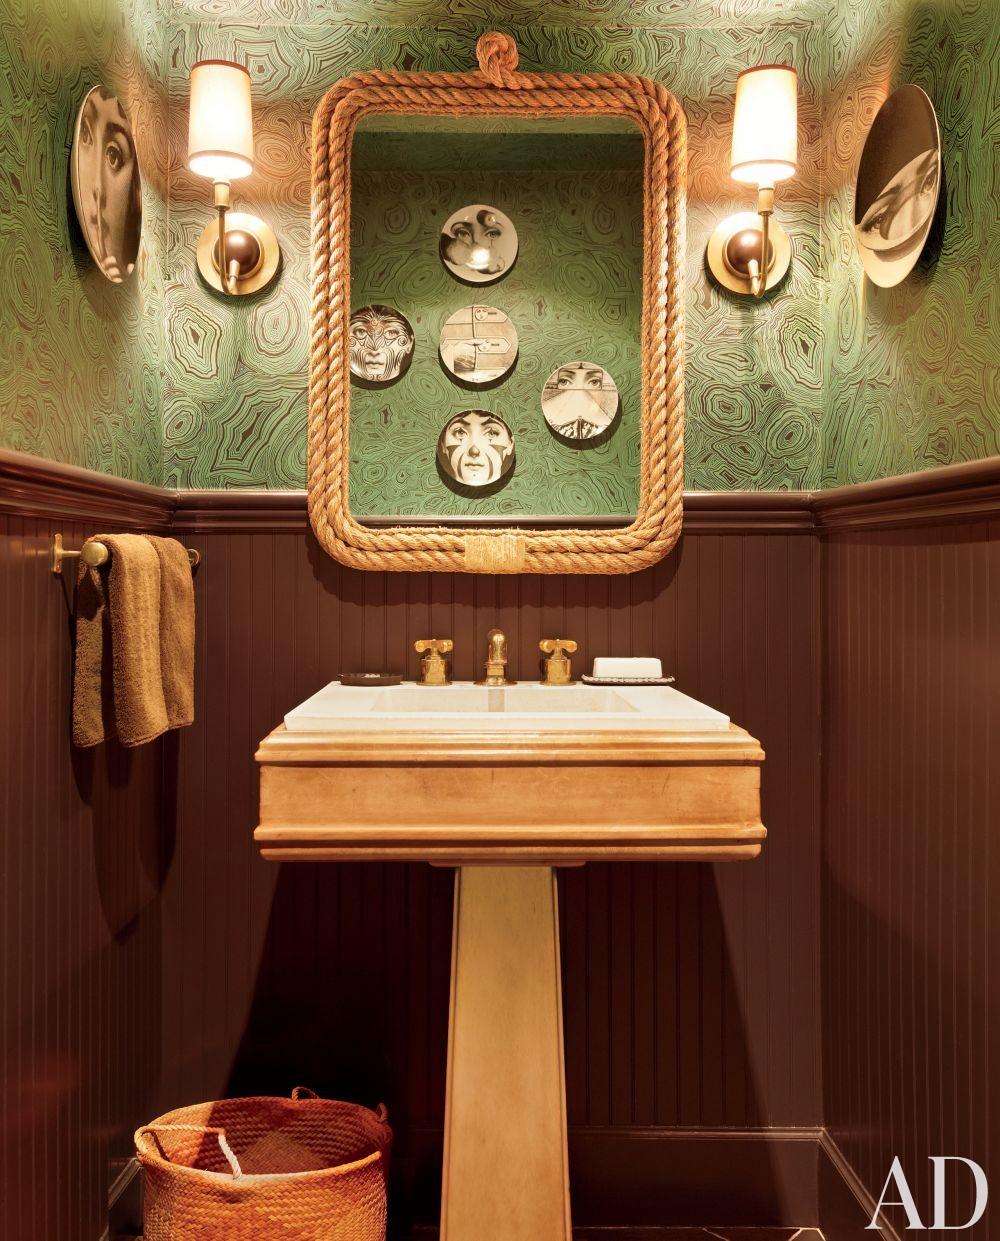 Contemporary Bathroom by Nate Berkus in New York, New York